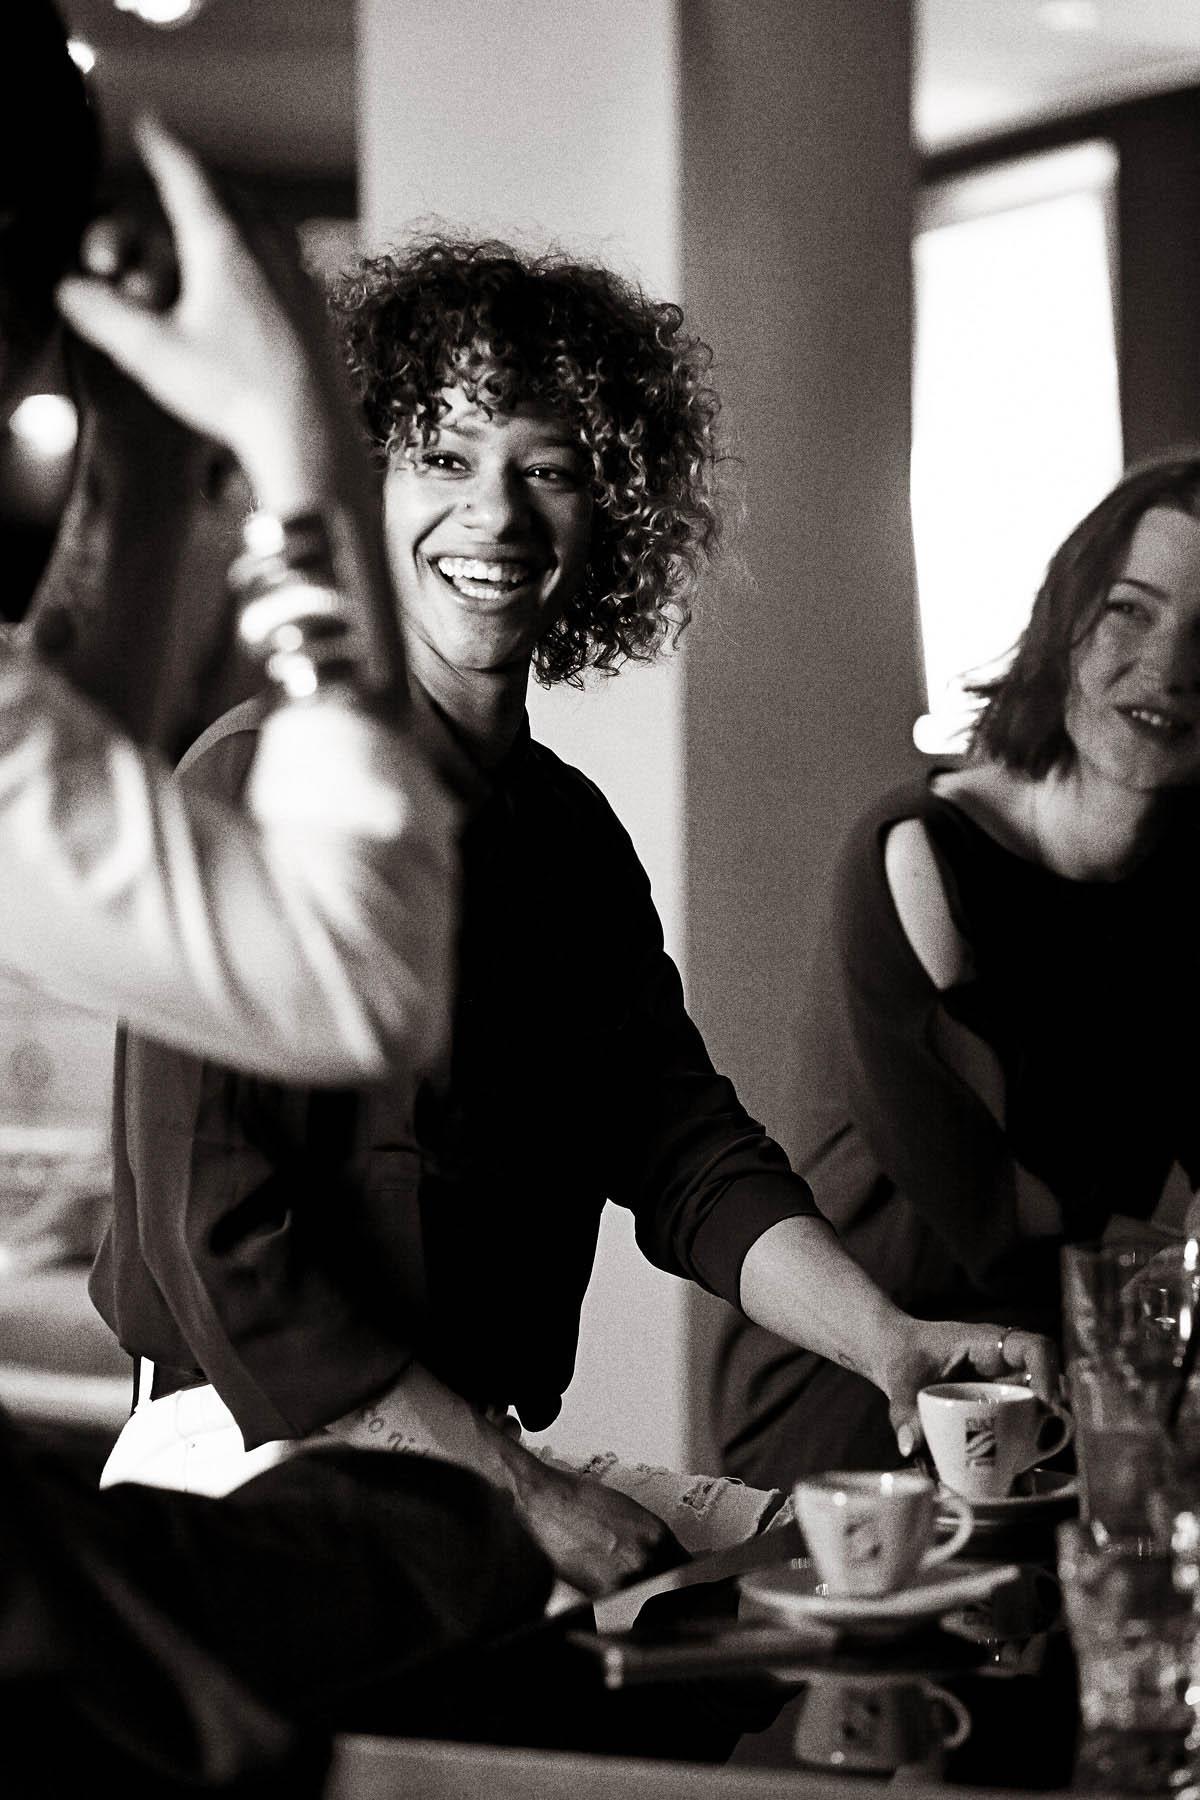 Cult-Caffe-Sappert-Auftragsfoto-at_ _MG_9509